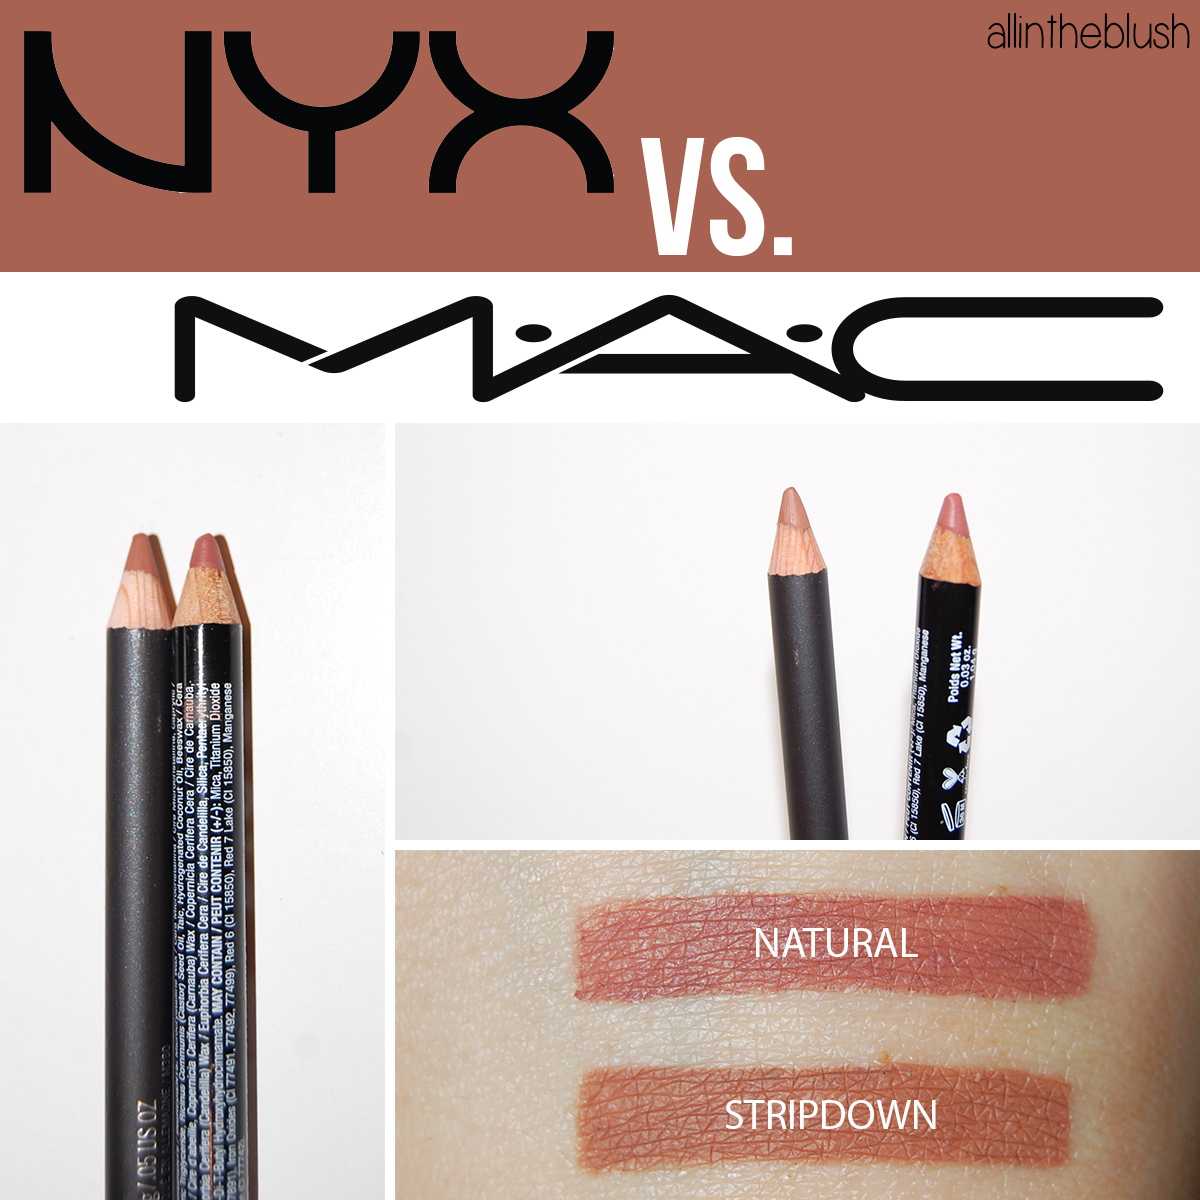 Dupe: MAC Stripdown Lipliner vs. NYX Natural Lipliner